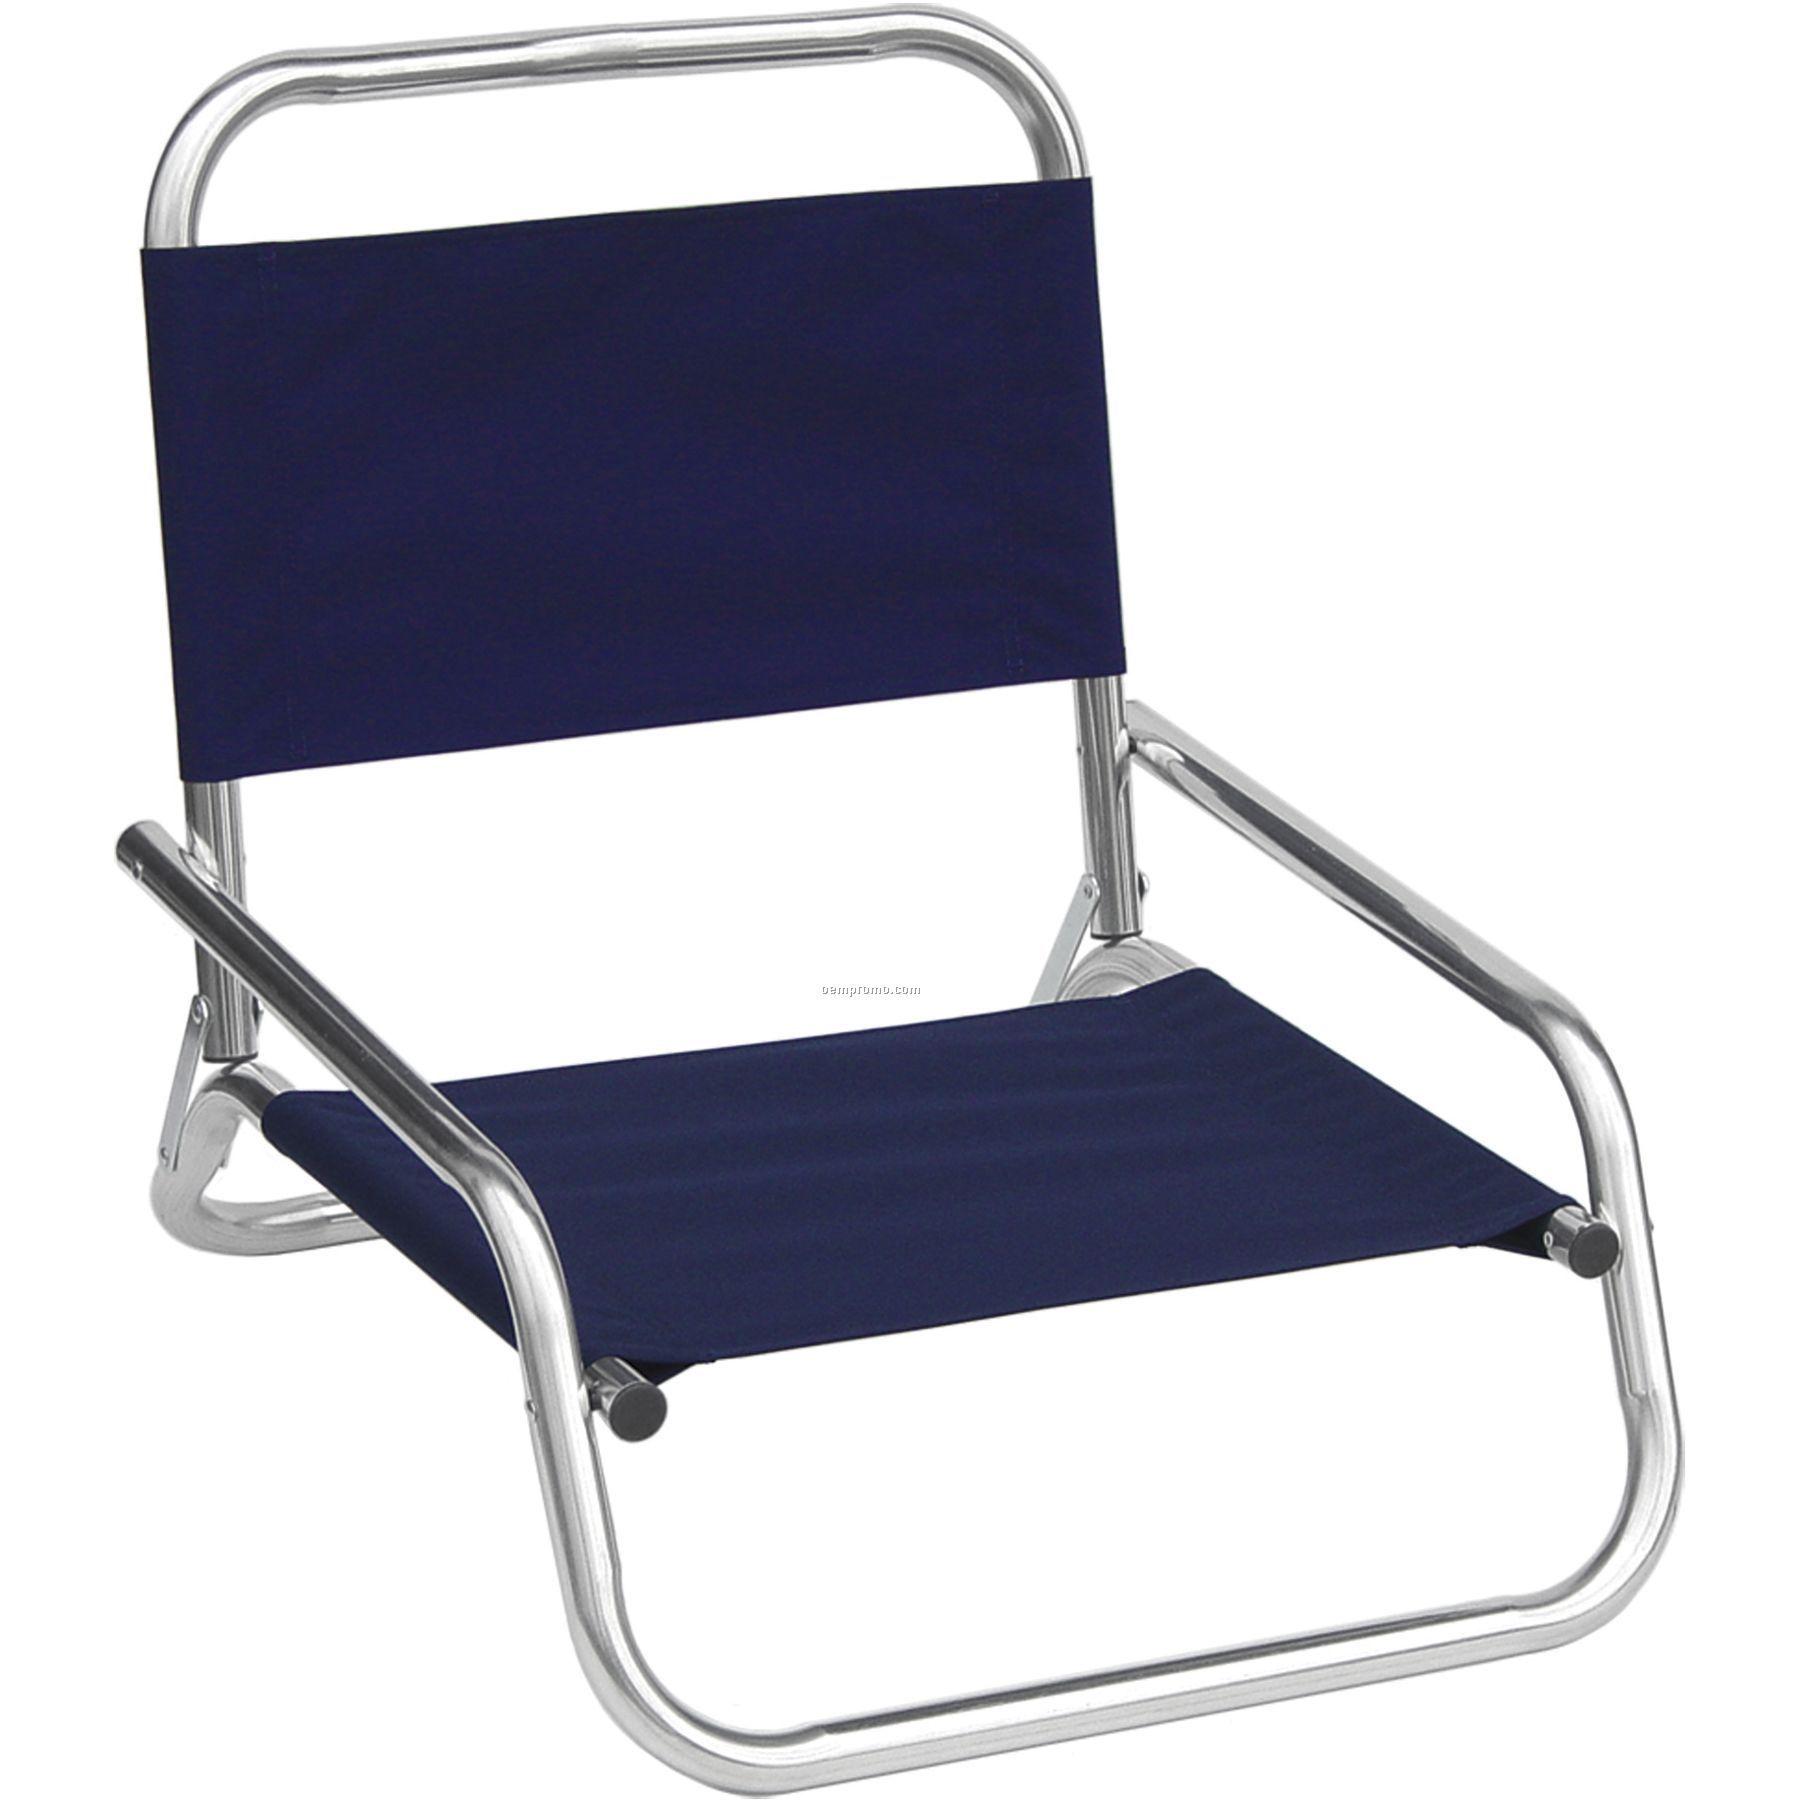 Ideal Low Folding Beach Chair  Low Price Folding Beach